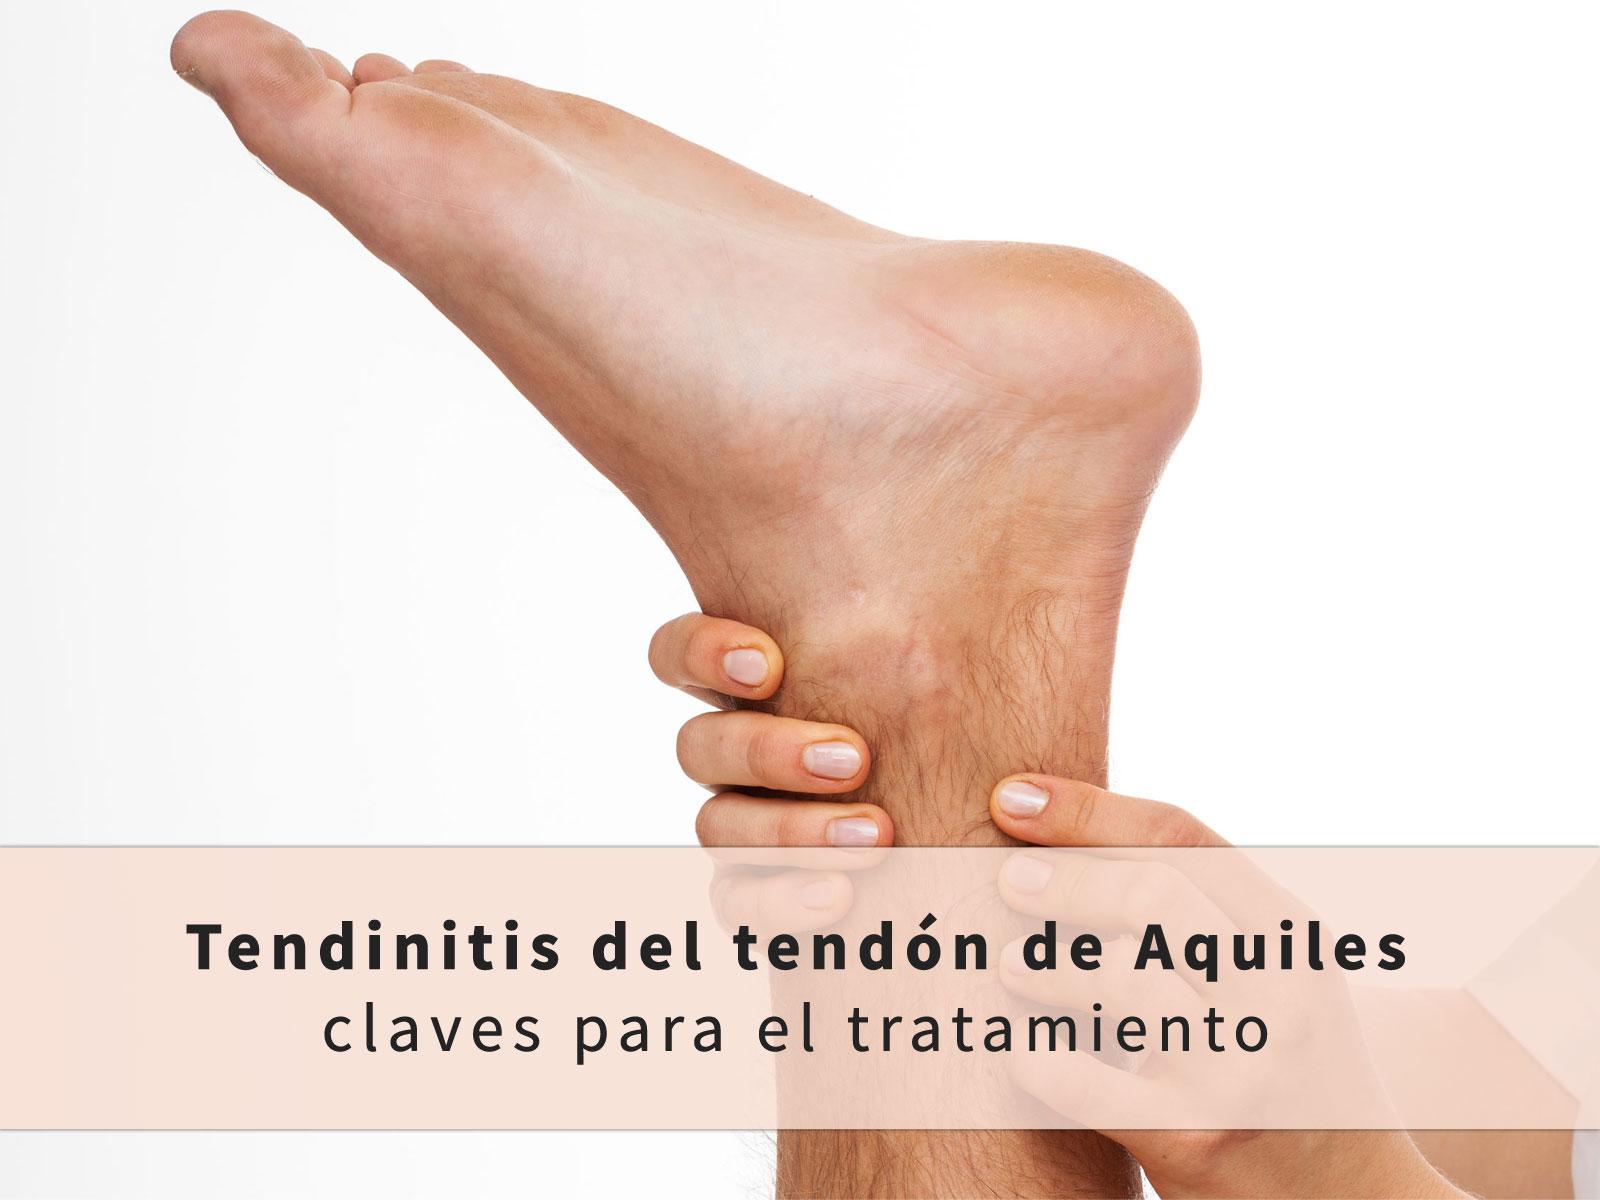 tratamiento-tendinitis-tendon-de-aquiles